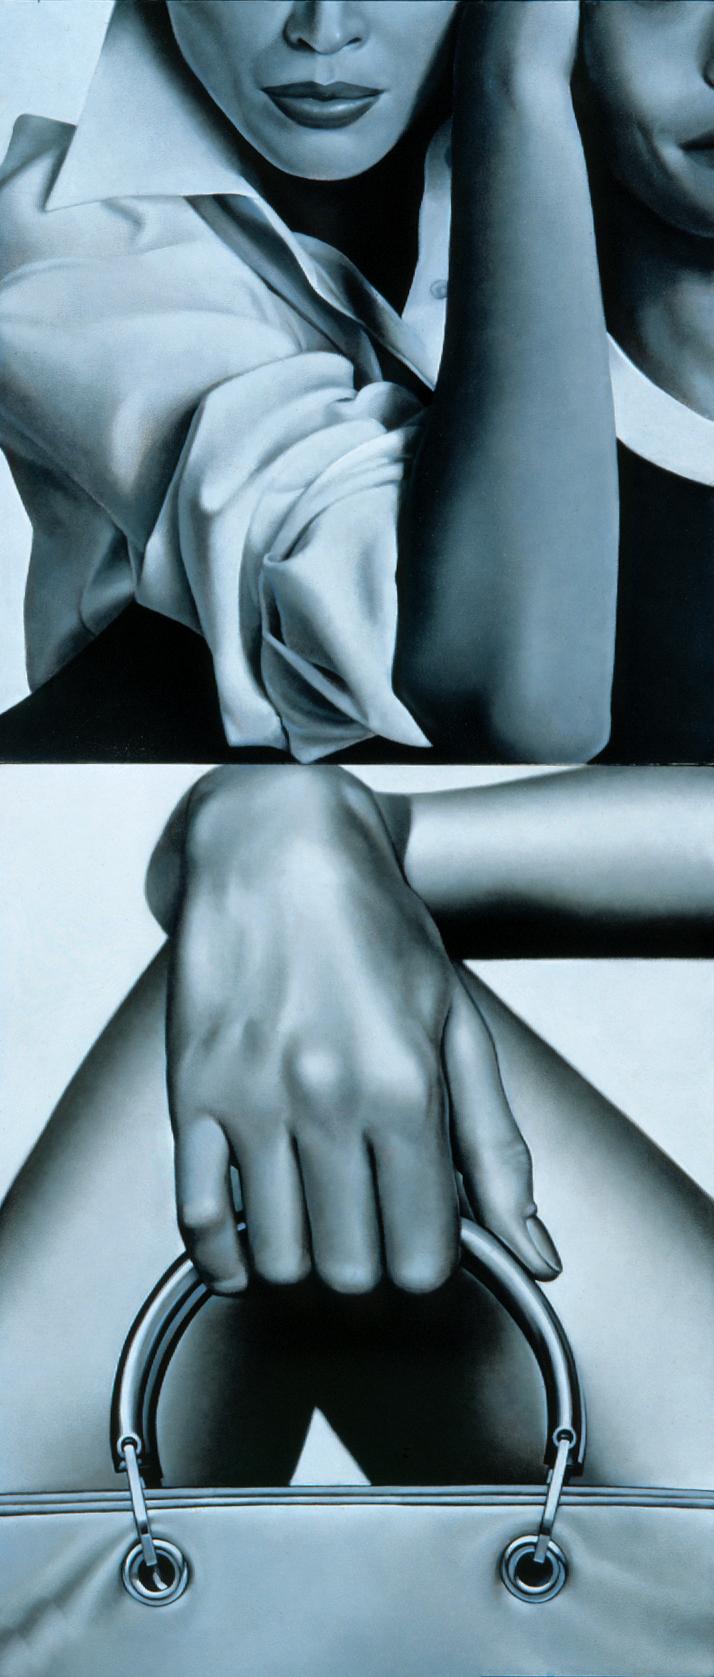 Untitled, 1998